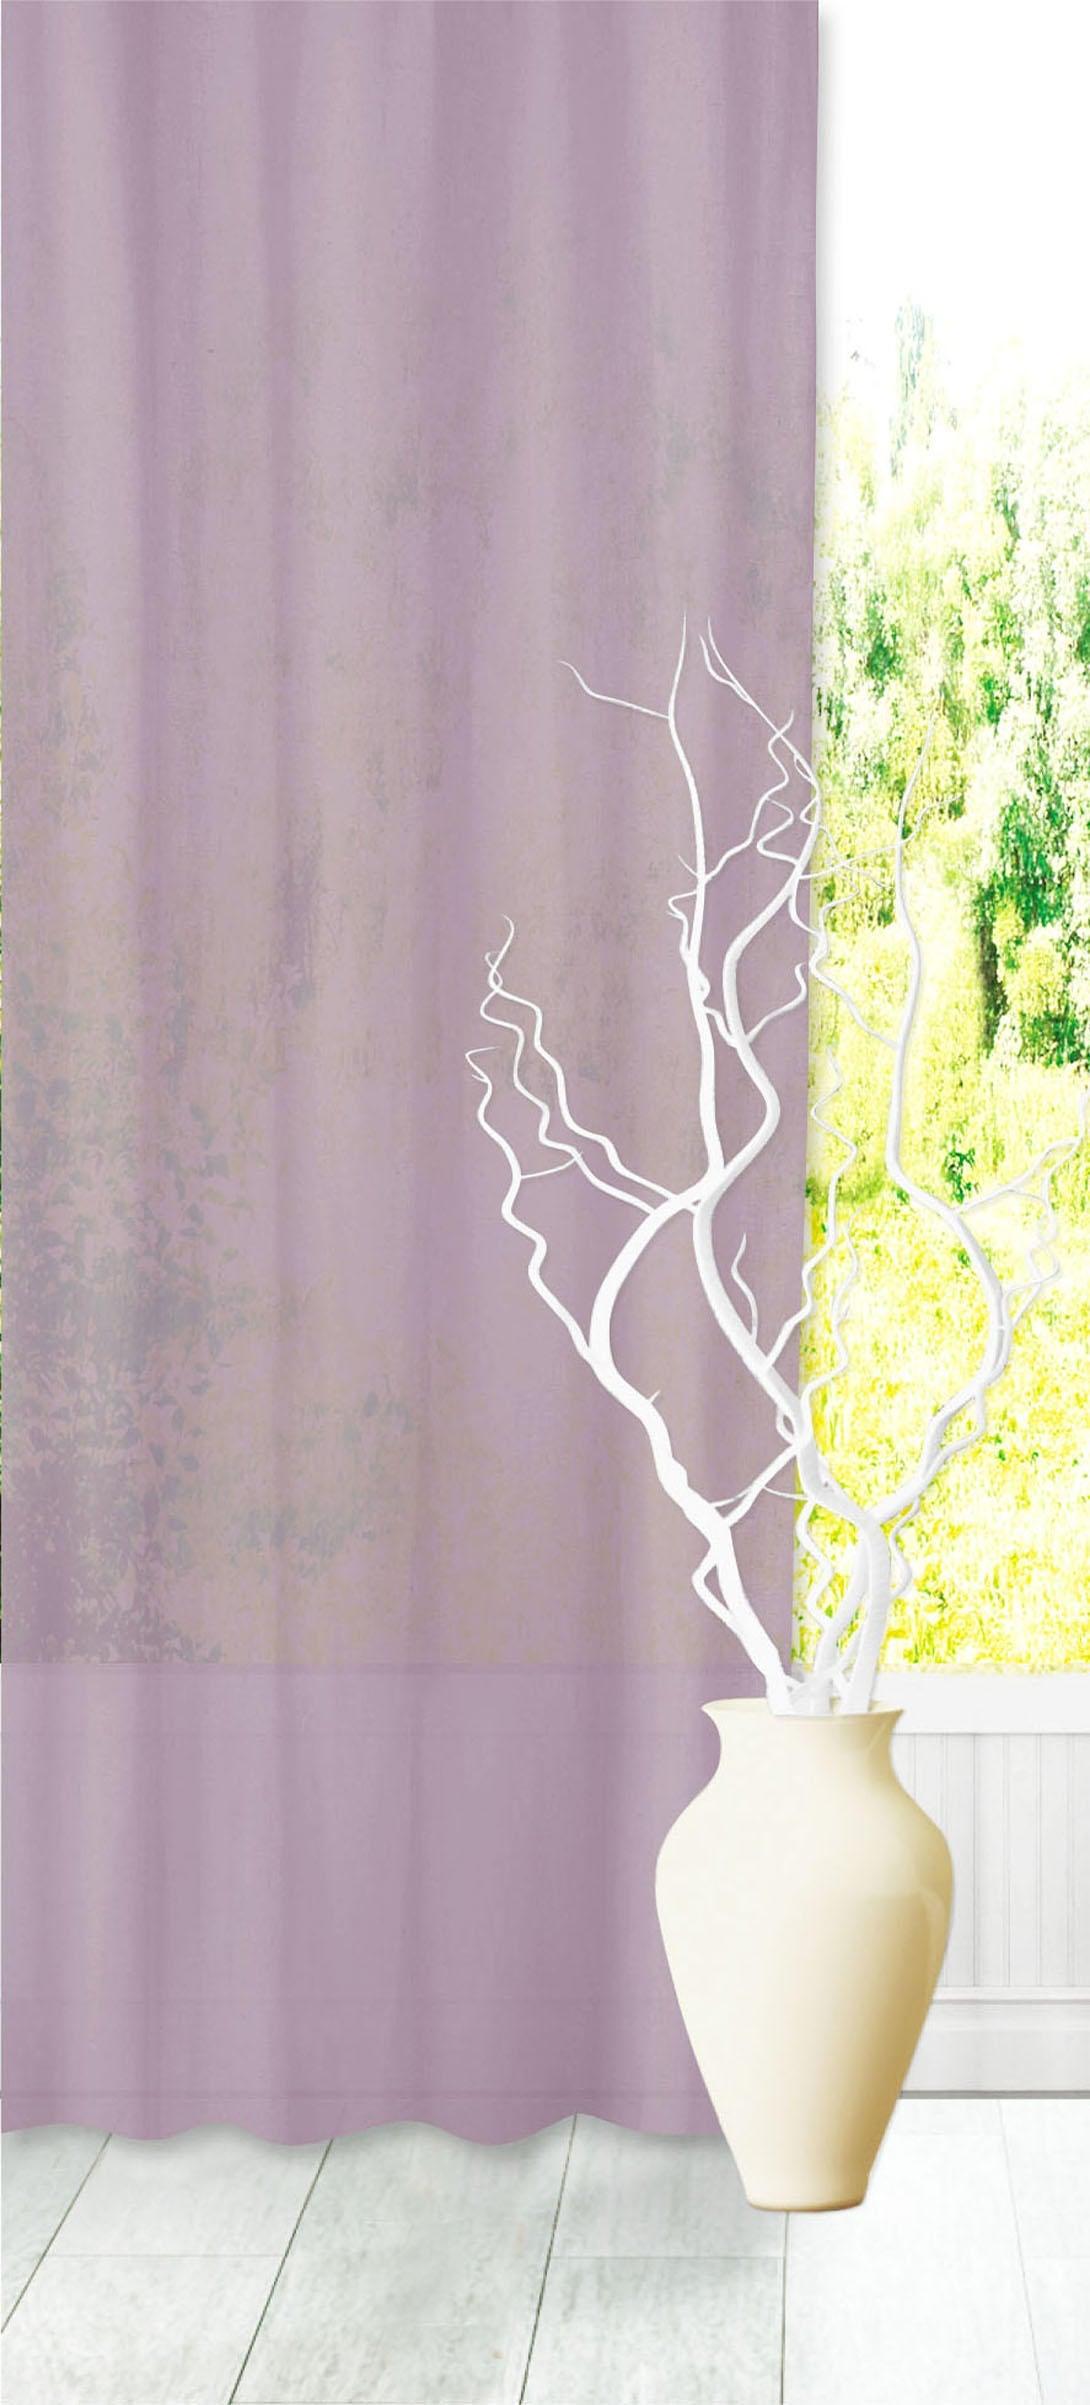 Tenda INSPIRE Abby viola fettuccia e passanti 200 x 280 cm - 3